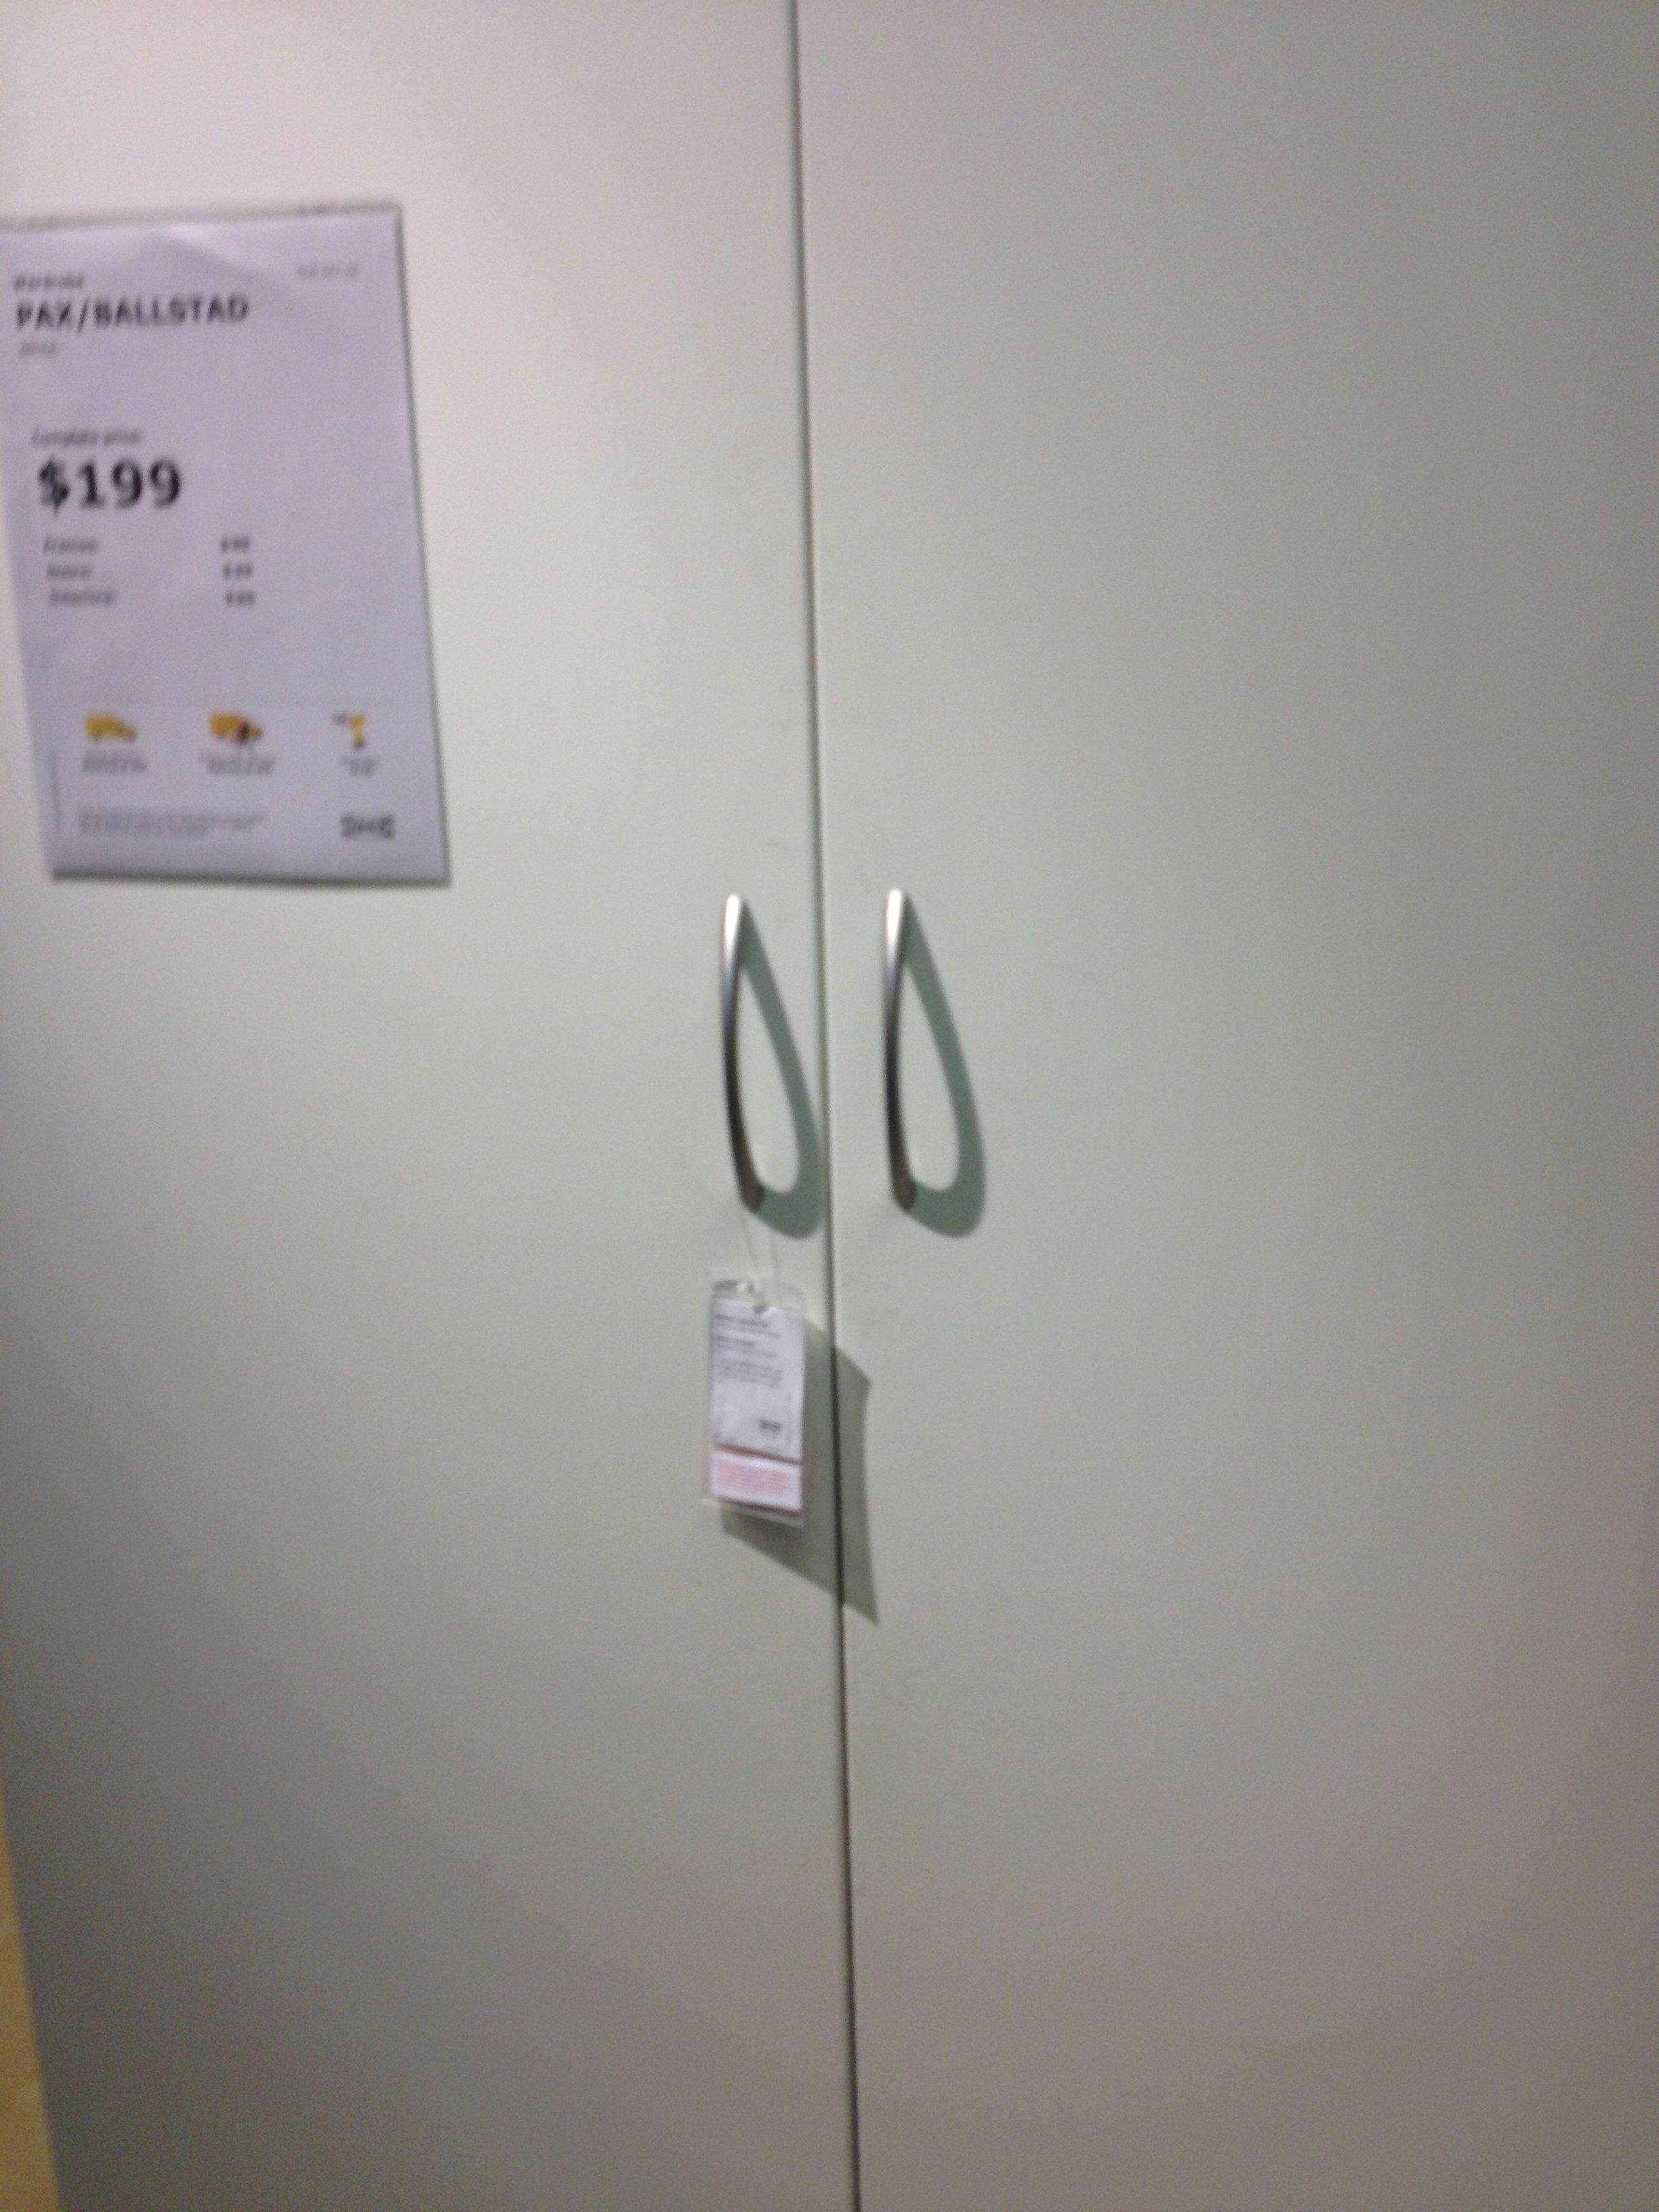 PAX/BALLSTAD Wardrobe $199 | Ikea Room Inspiration | Pinterest ...